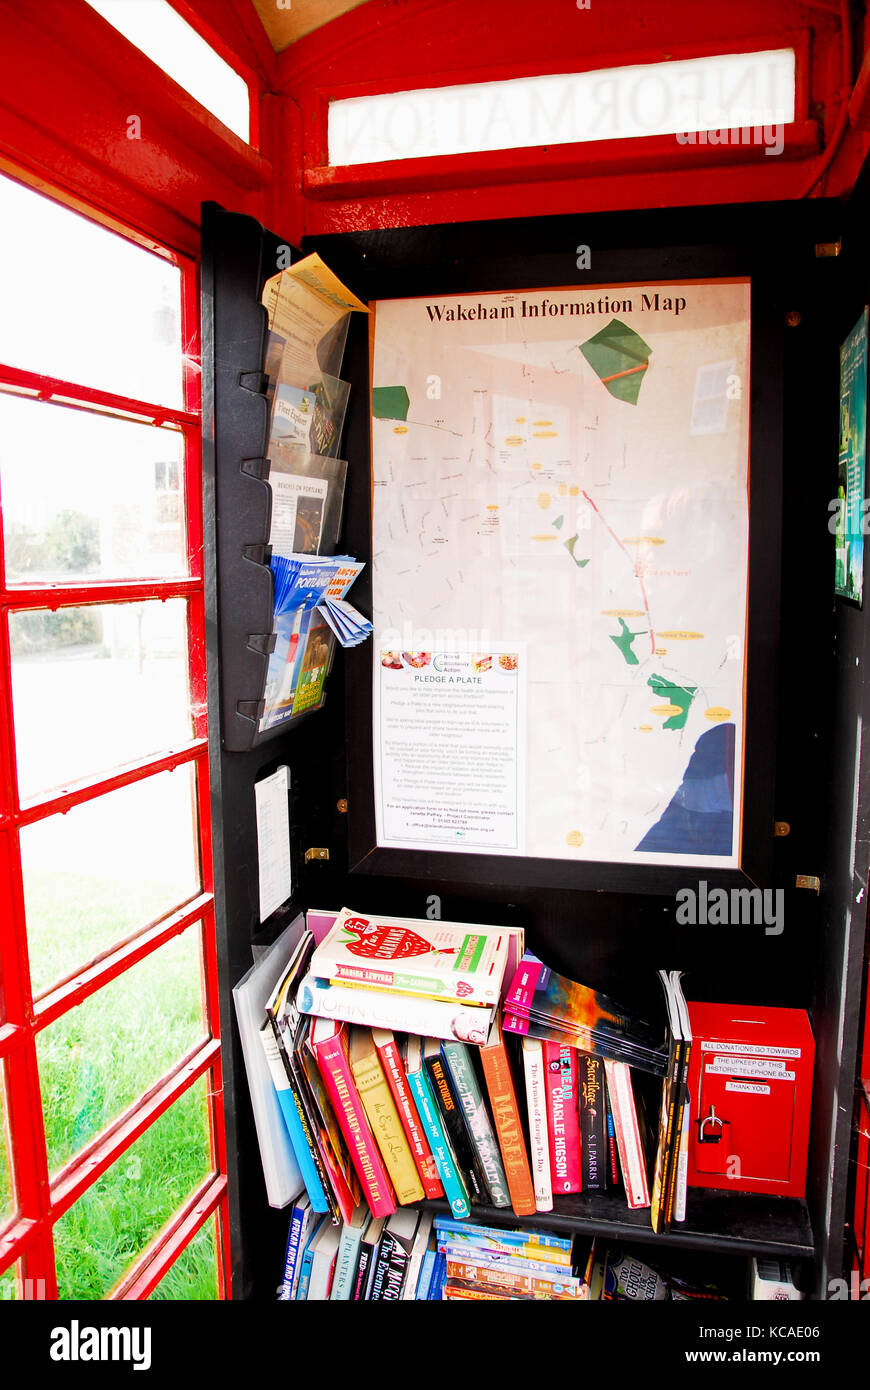 Wakeham, Dorset, UK. 3rd October 2017 - The former GPO telephone kiosk in Wakeham, Isle of Portland, which has been - Stock Image